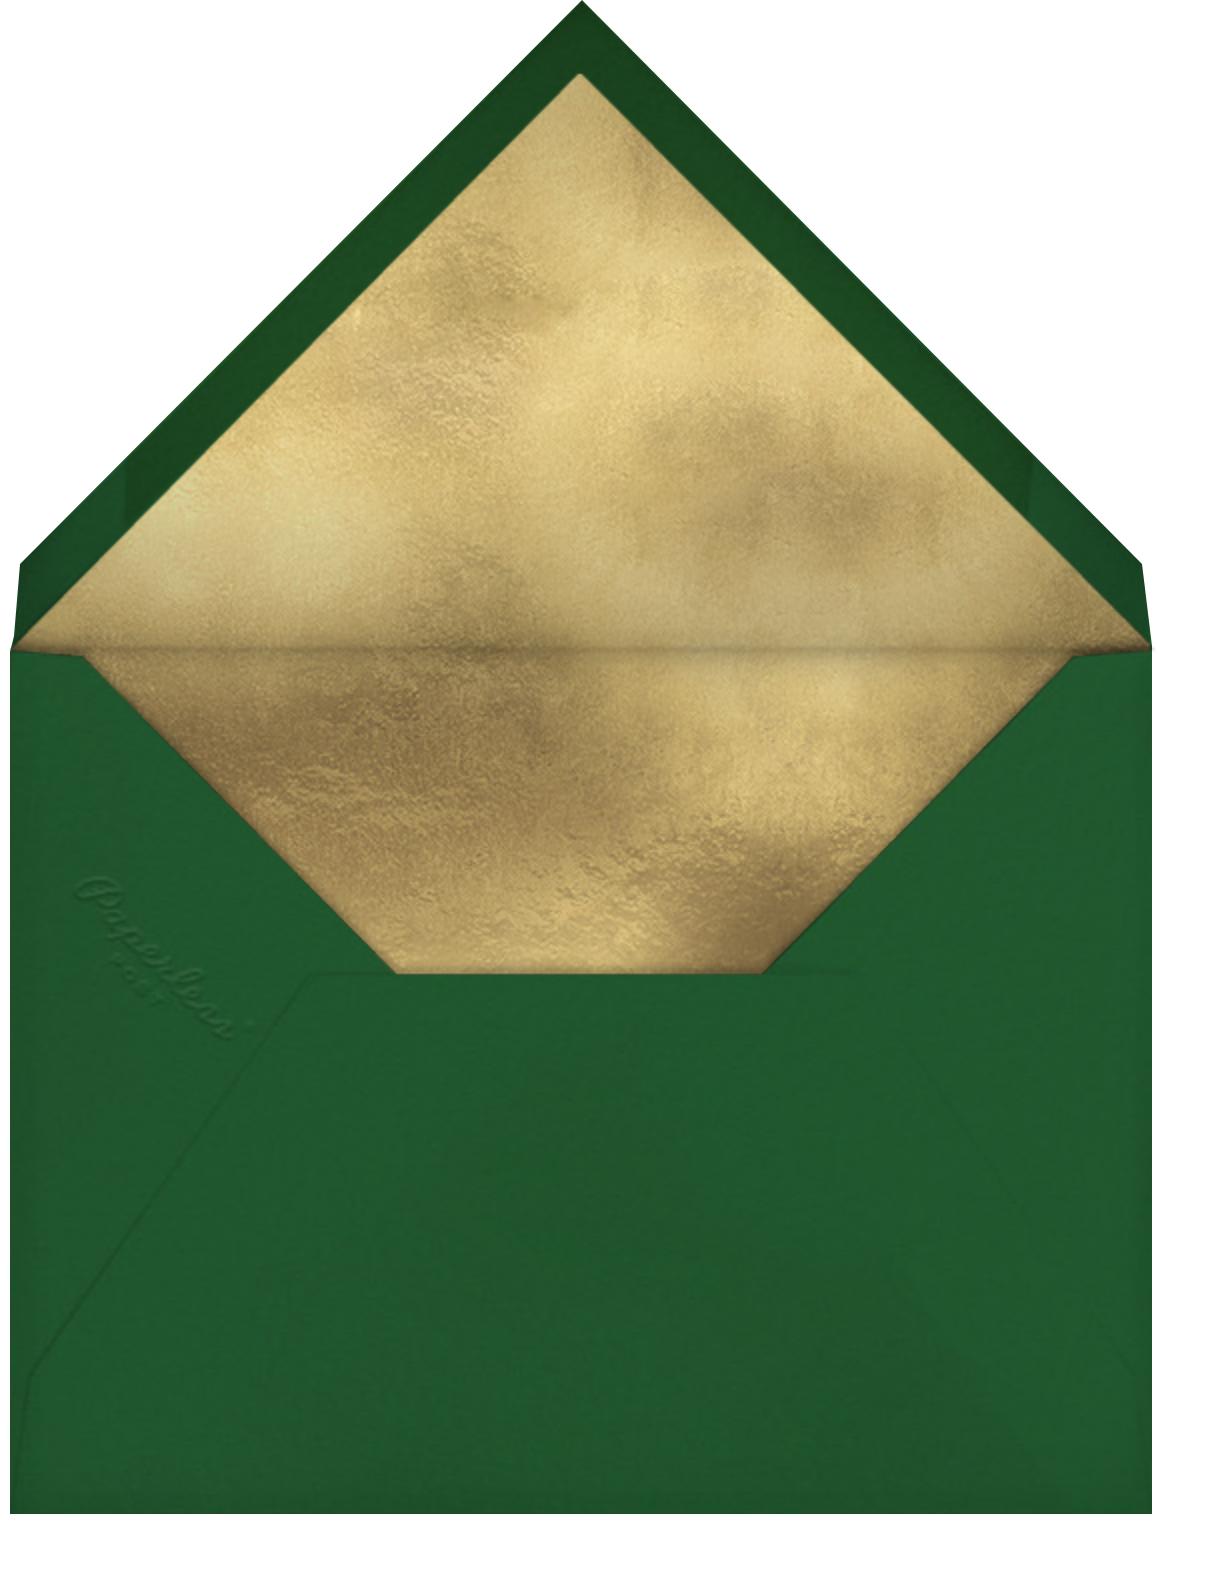 Joyful Moments - Green - Paperless Post - Envelope